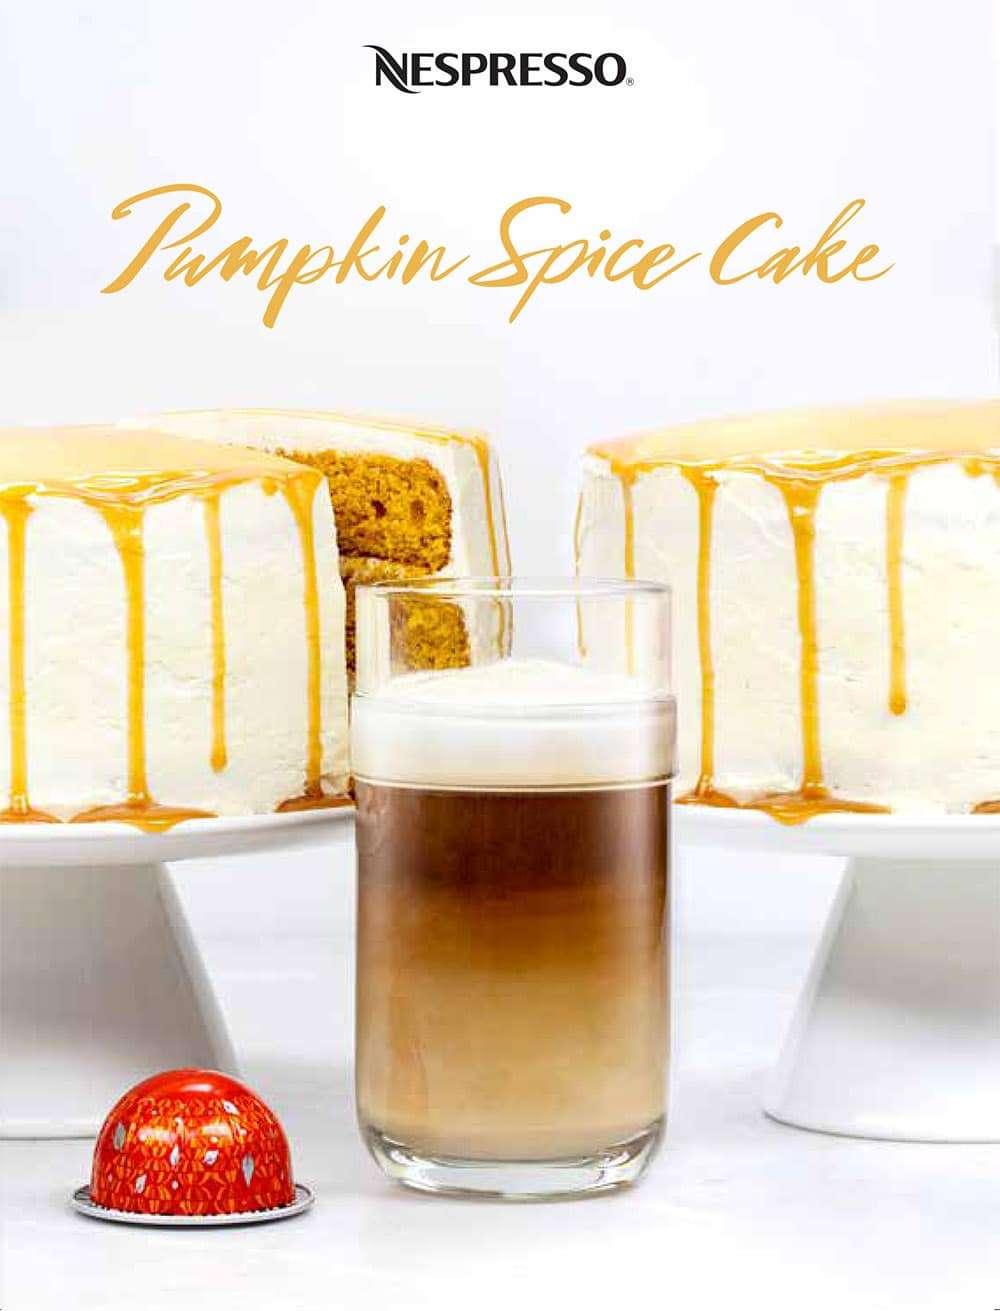 Pumpkin Spice latte in front of 2 Pumpkin spice cakes.